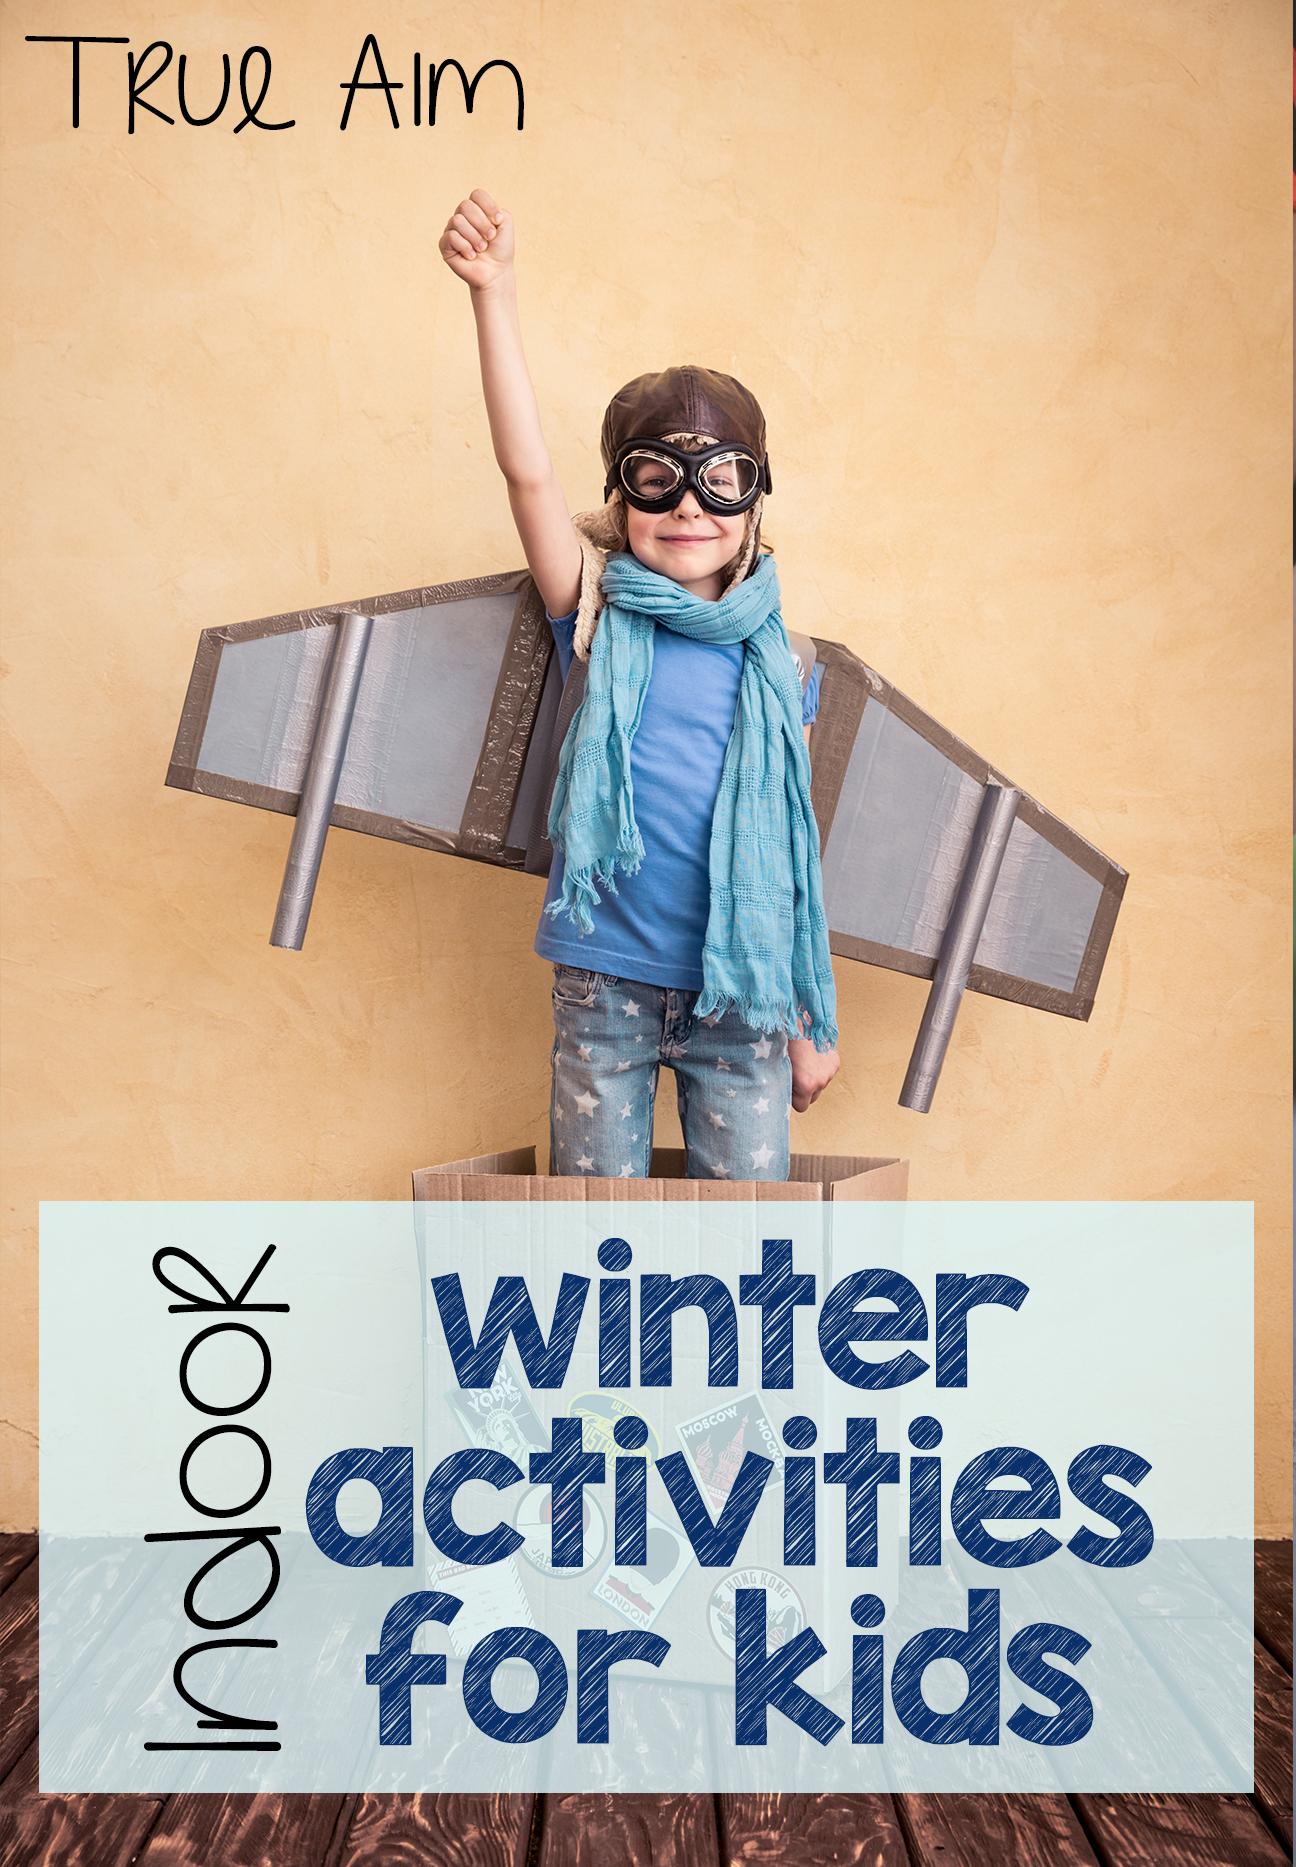 Indoor winter activities and mom 39 s library 170 true aim for Indoor crafts for kids